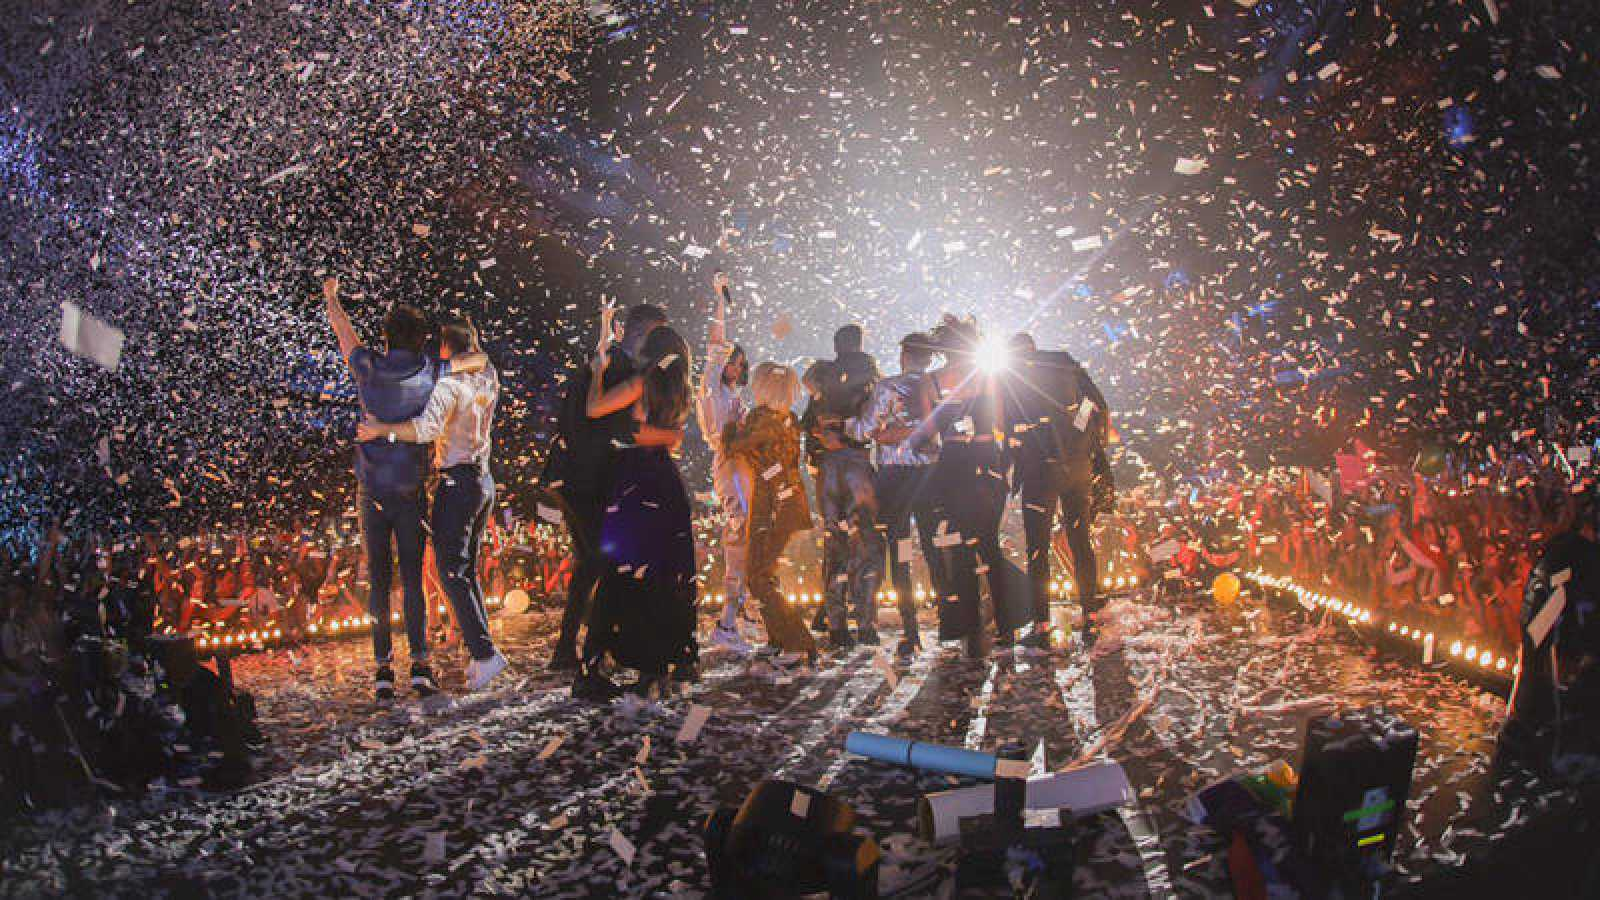 OT 2018 reaunuda su gira en el Palau Sant Jordi de Barcelona